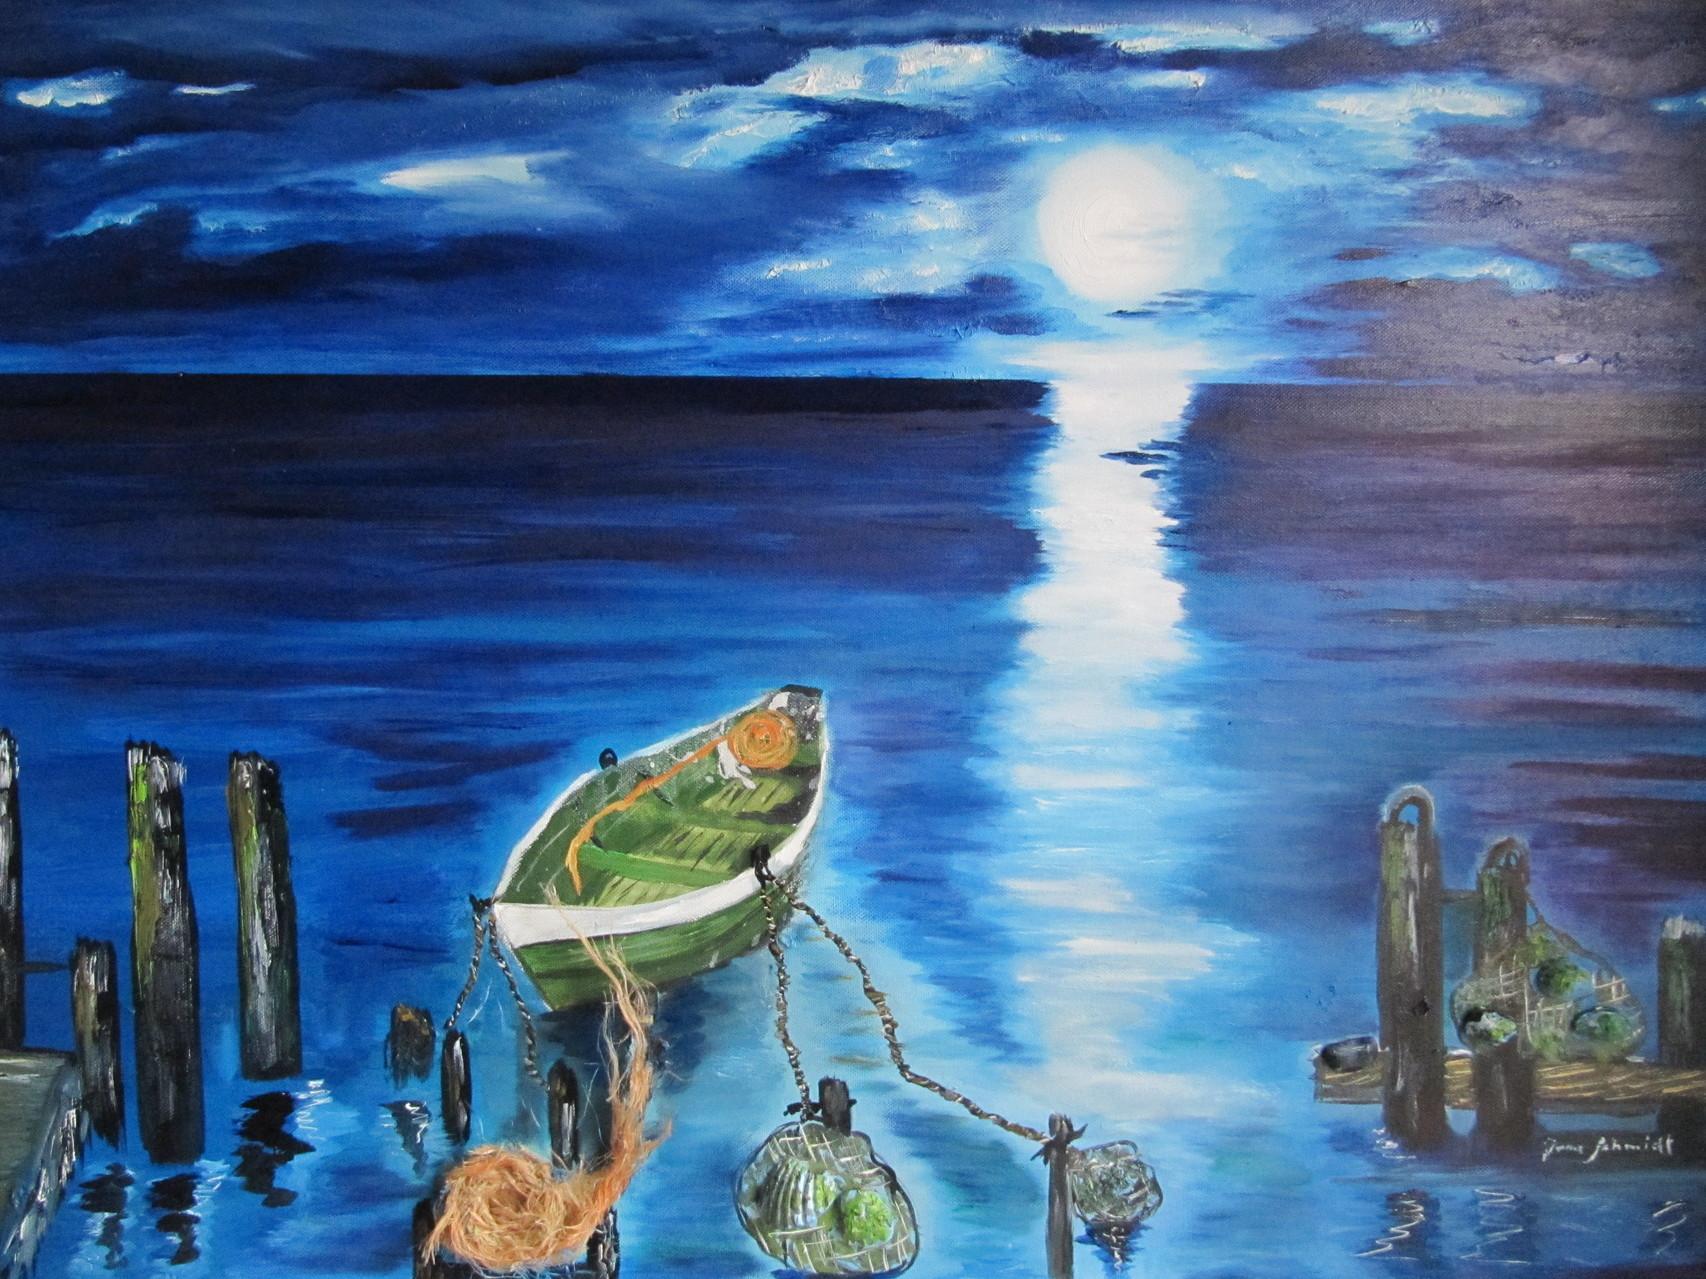 Moonlight 60 x 80 Öl auf Leinwand